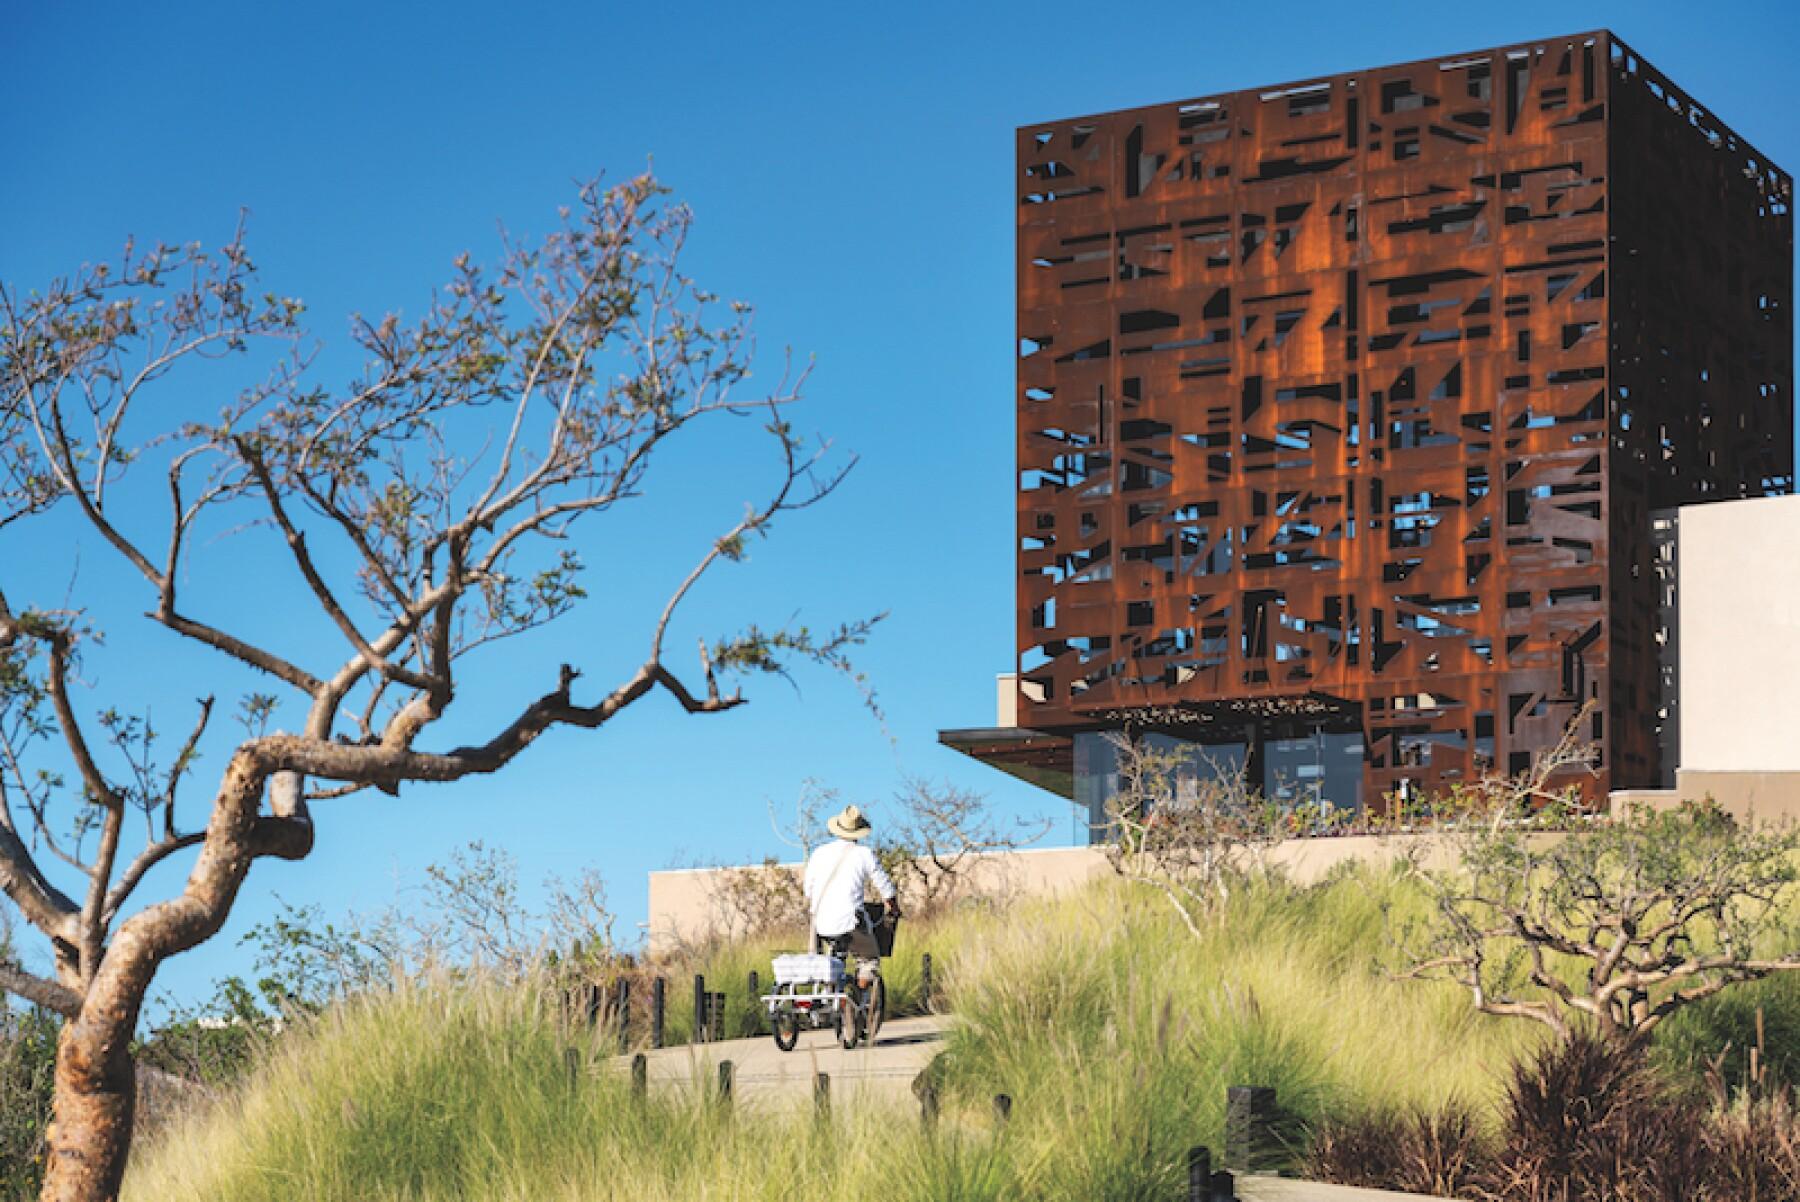 mejores hoteles de mexico.jpg